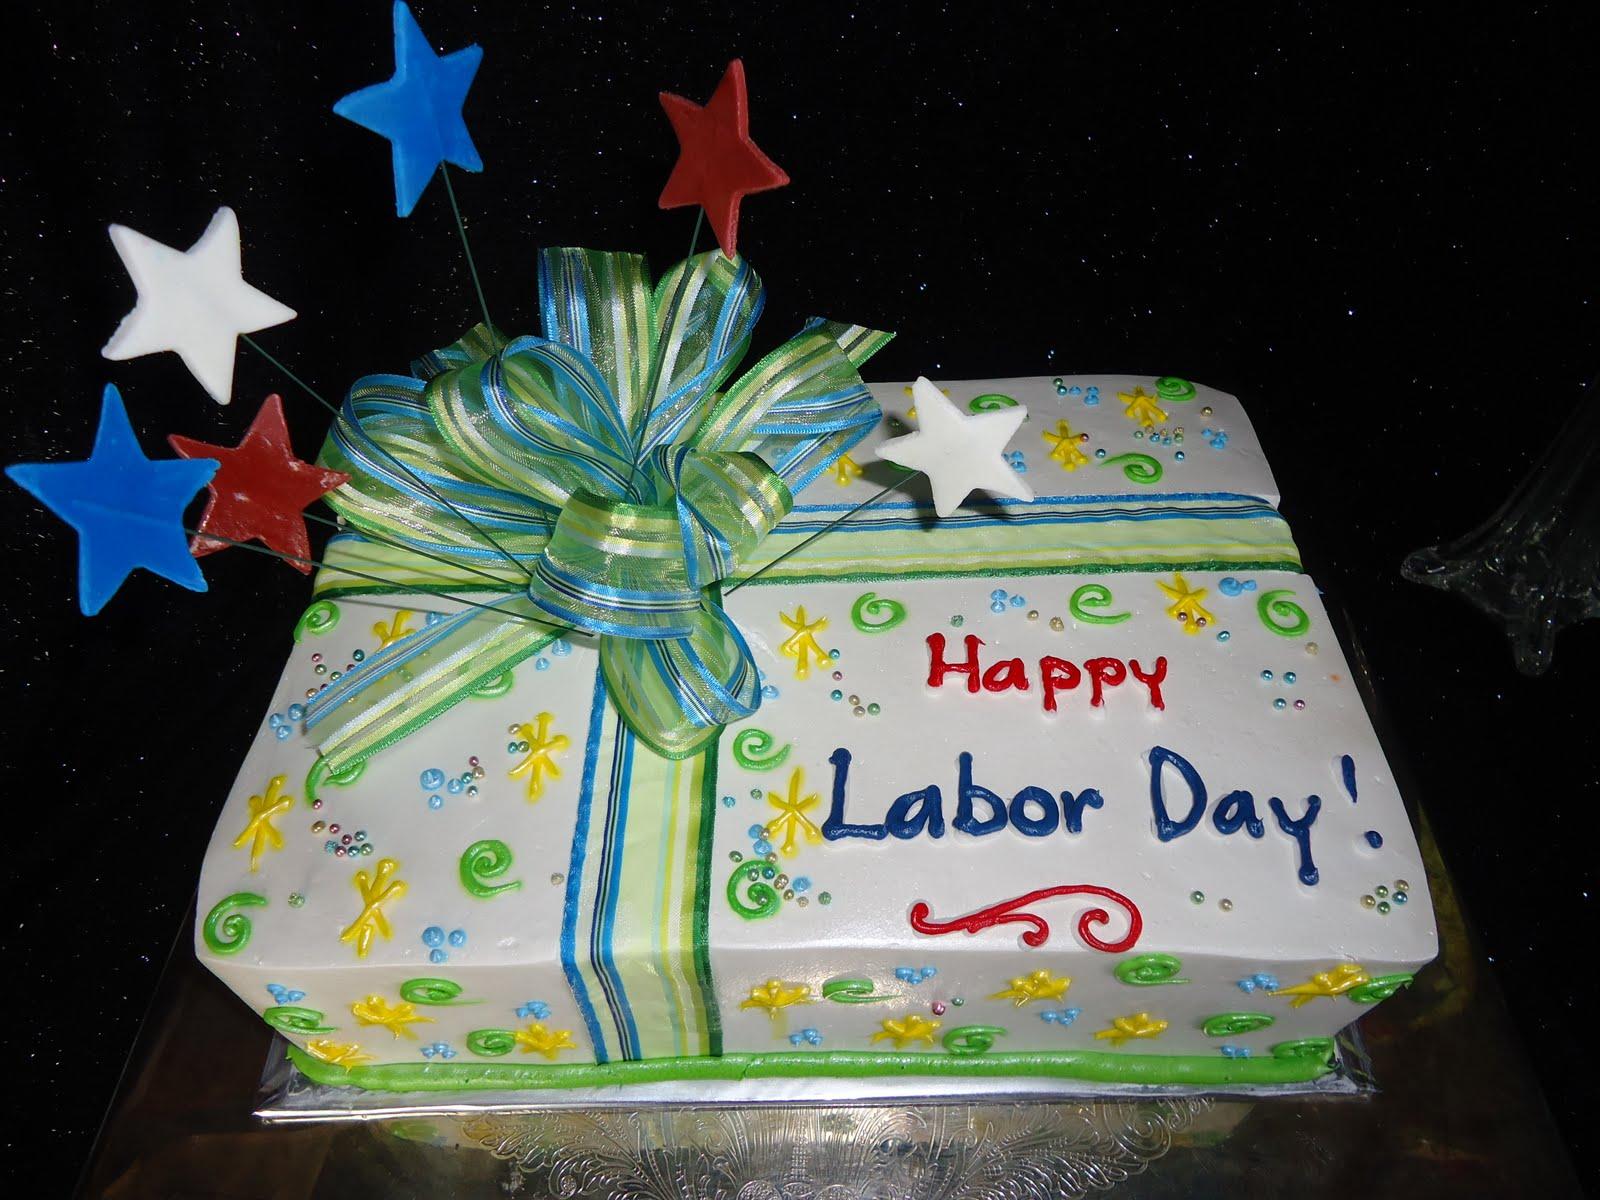 Labor Day Cake Ideas Images 1809 Bamboo Bakery 602 246 806